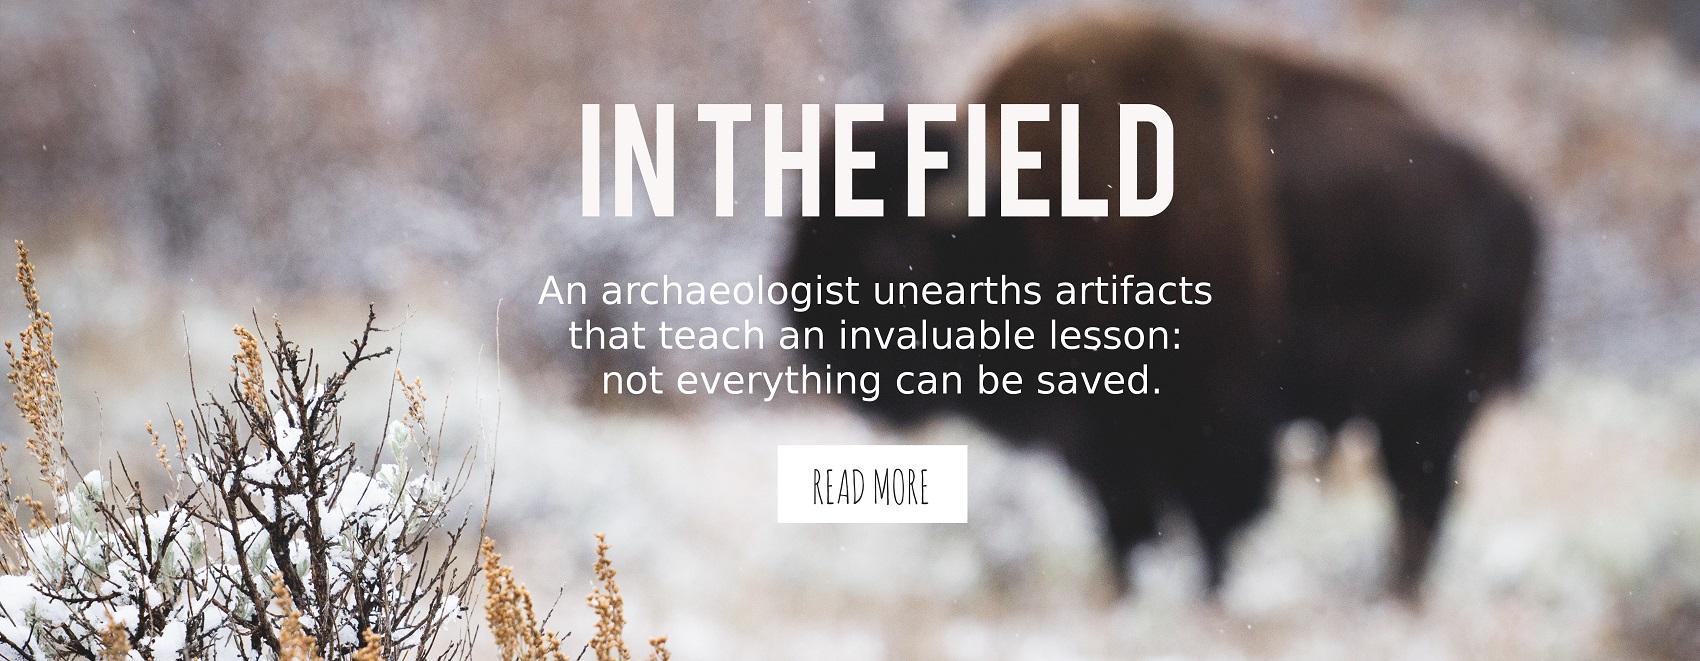 inthefield-readmore2